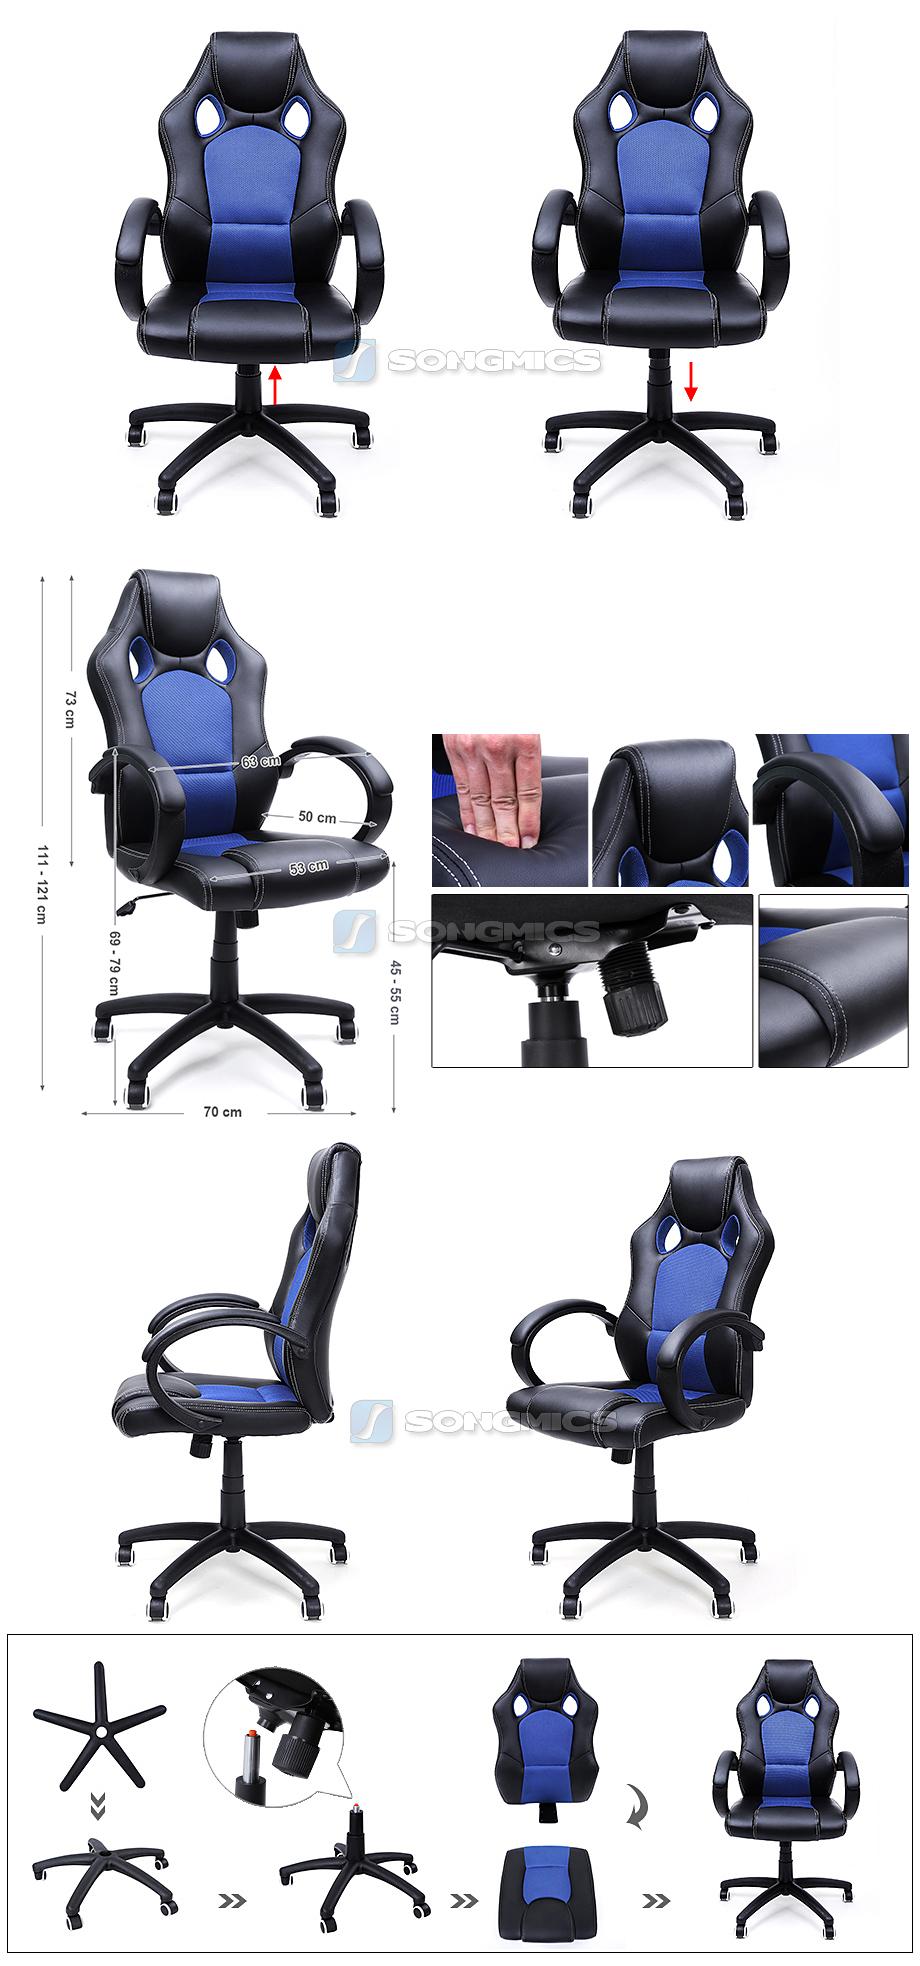 songmics racing stuhl b rostuhl chefsessel drehstuhl pu schwarz blau obg56l ebay. Black Bedroom Furniture Sets. Home Design Ideas